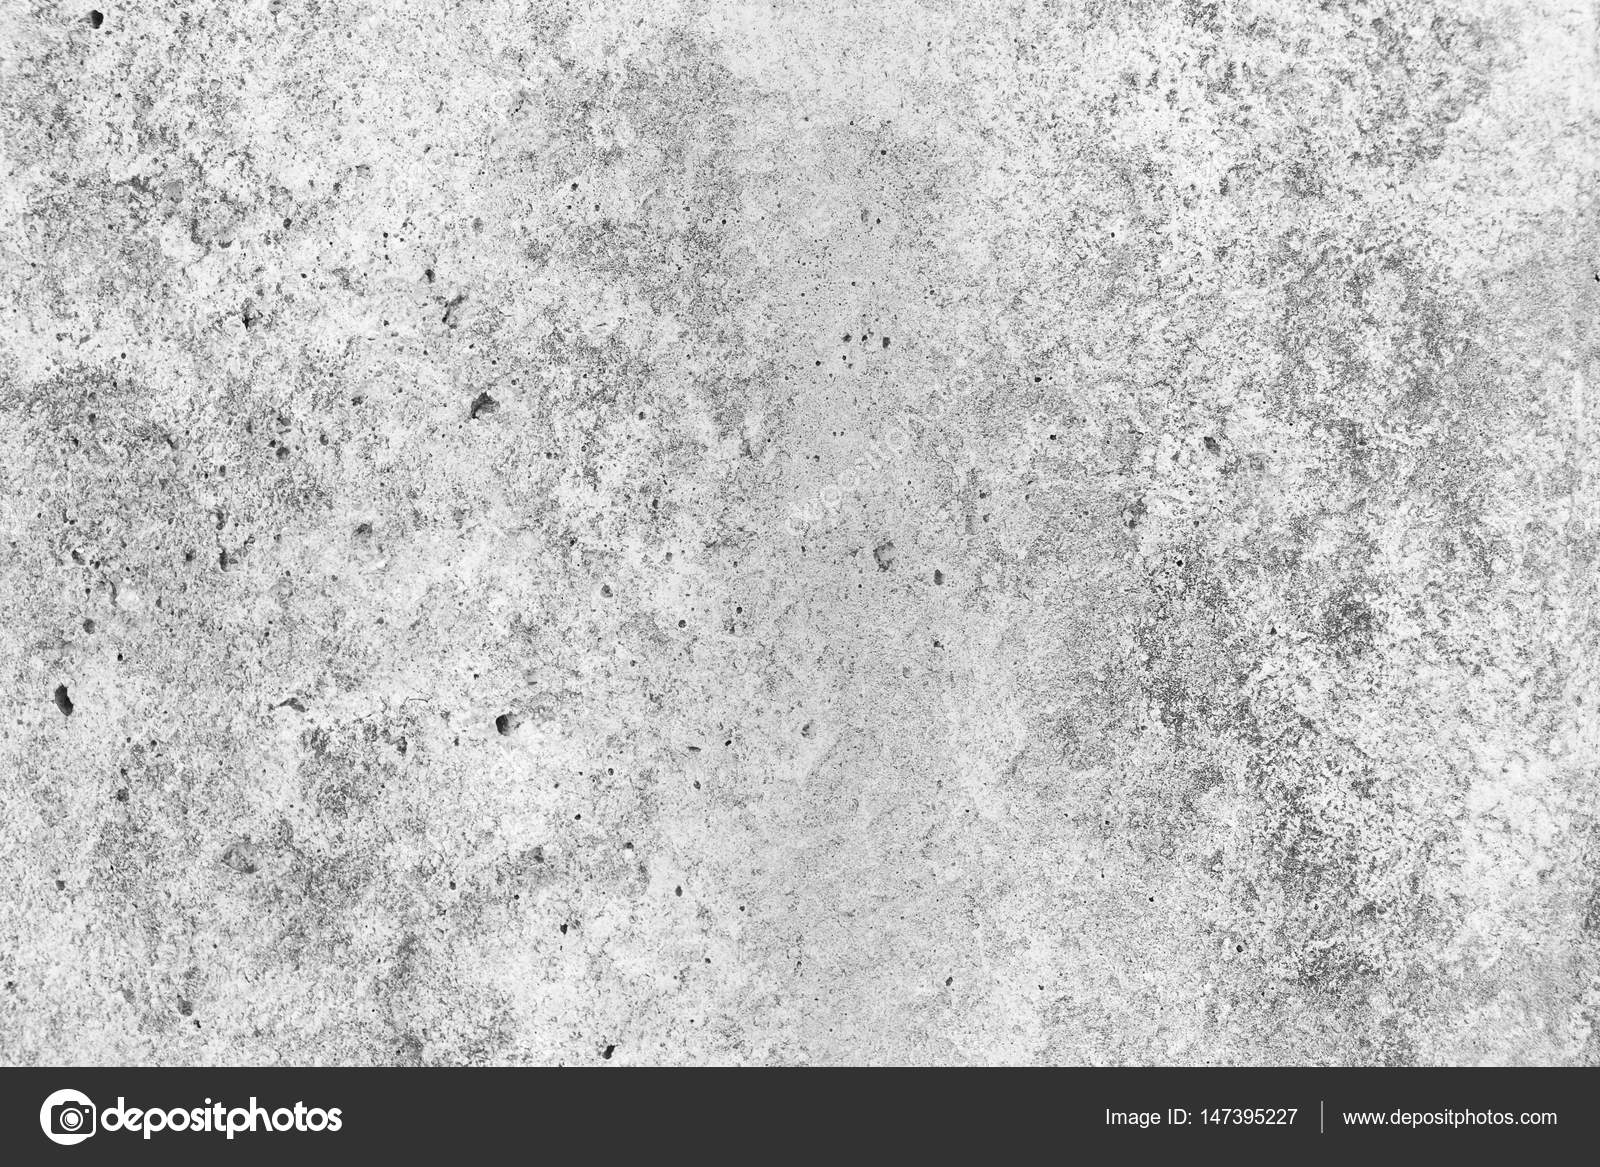 Textura hormig n pulido exterior foto de stock - Hormigon pulido para exterior ...